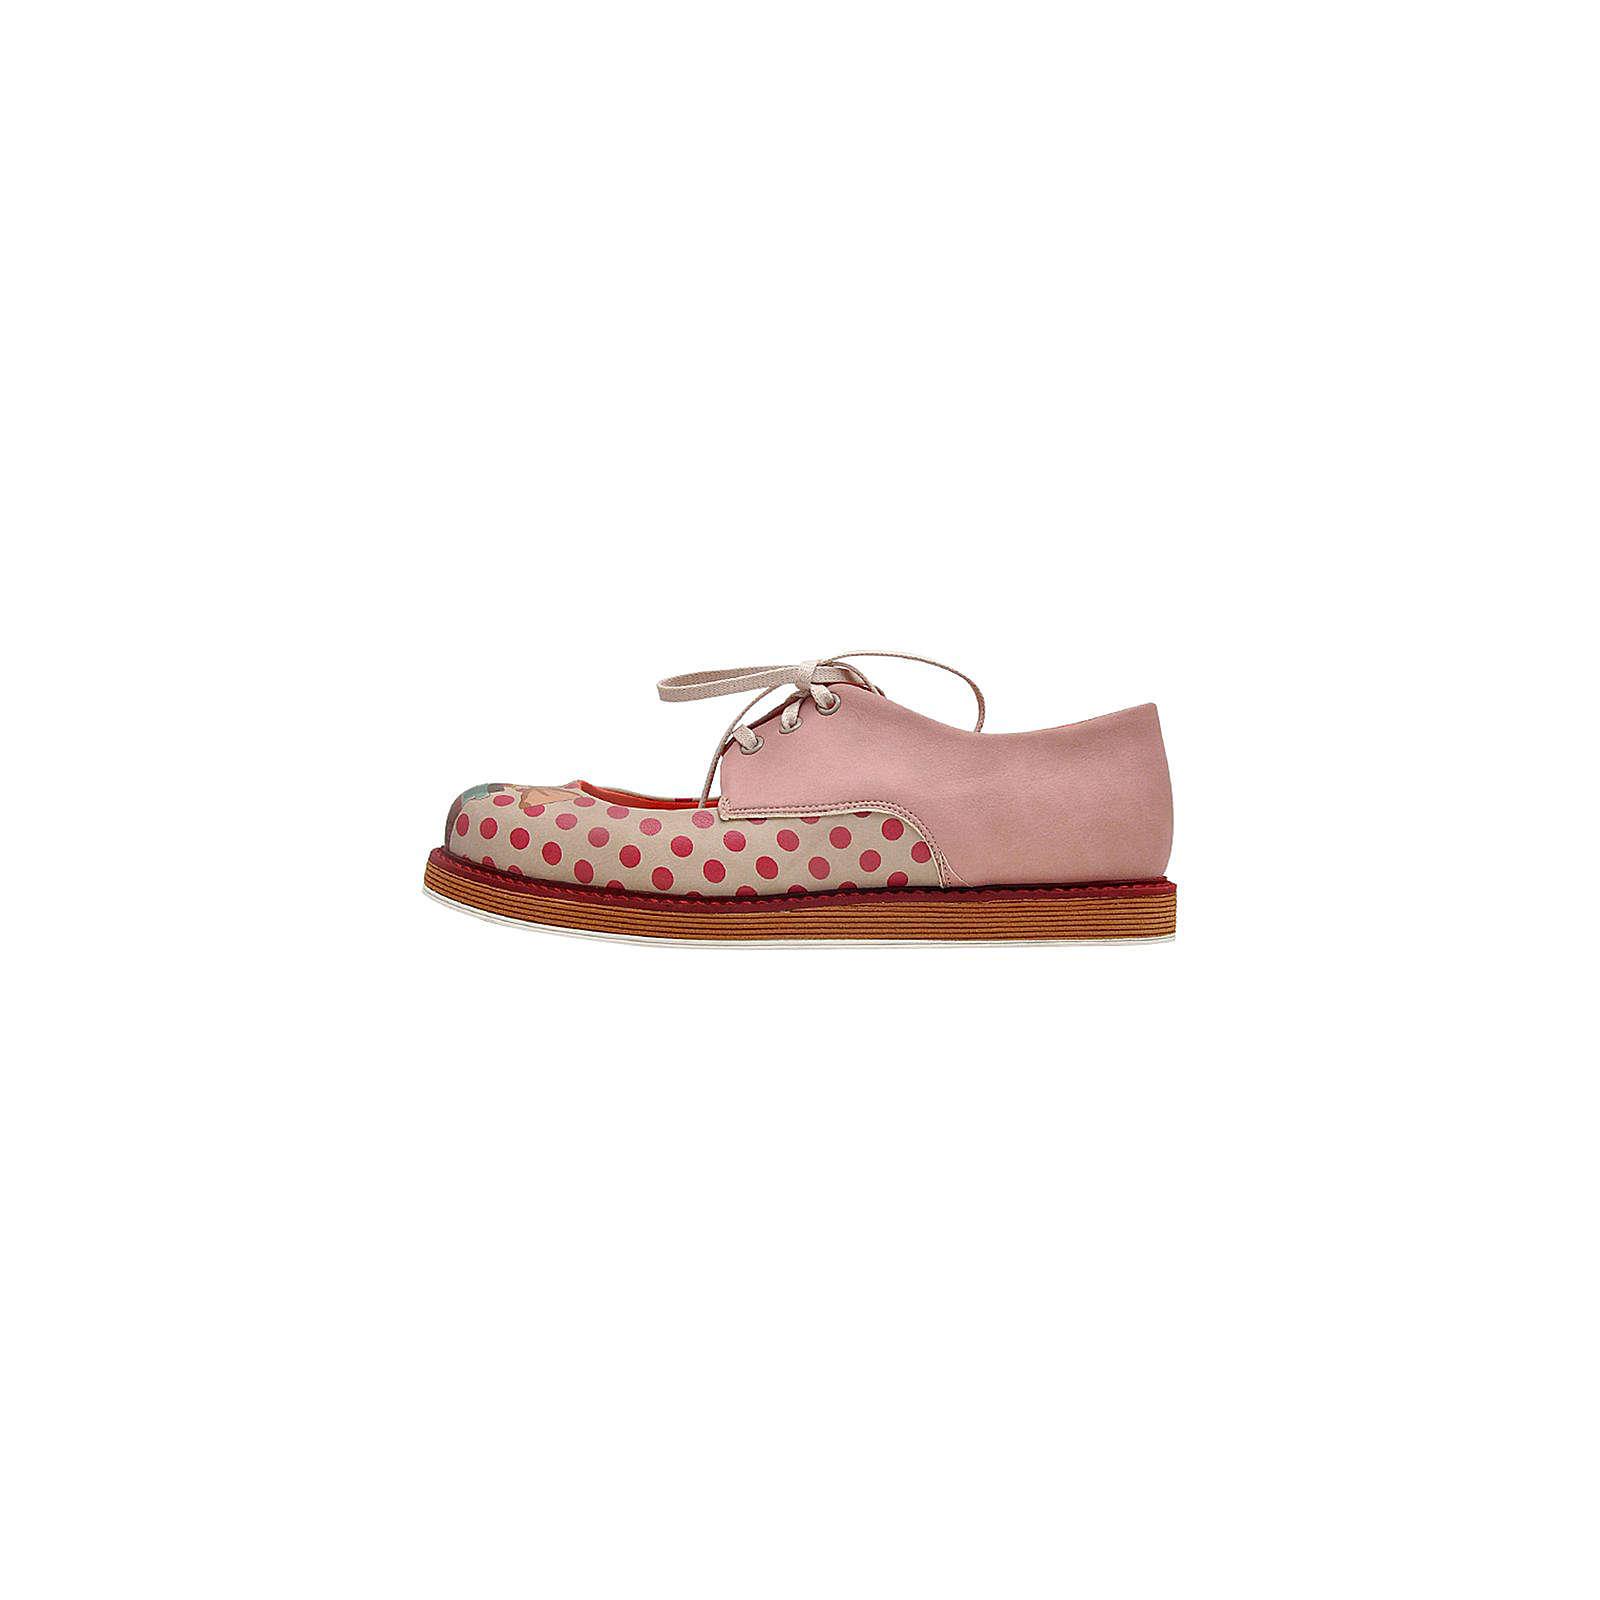 Dogo Shoes Schnürschuhe love potion mehrfarbig Damen Gr. 36